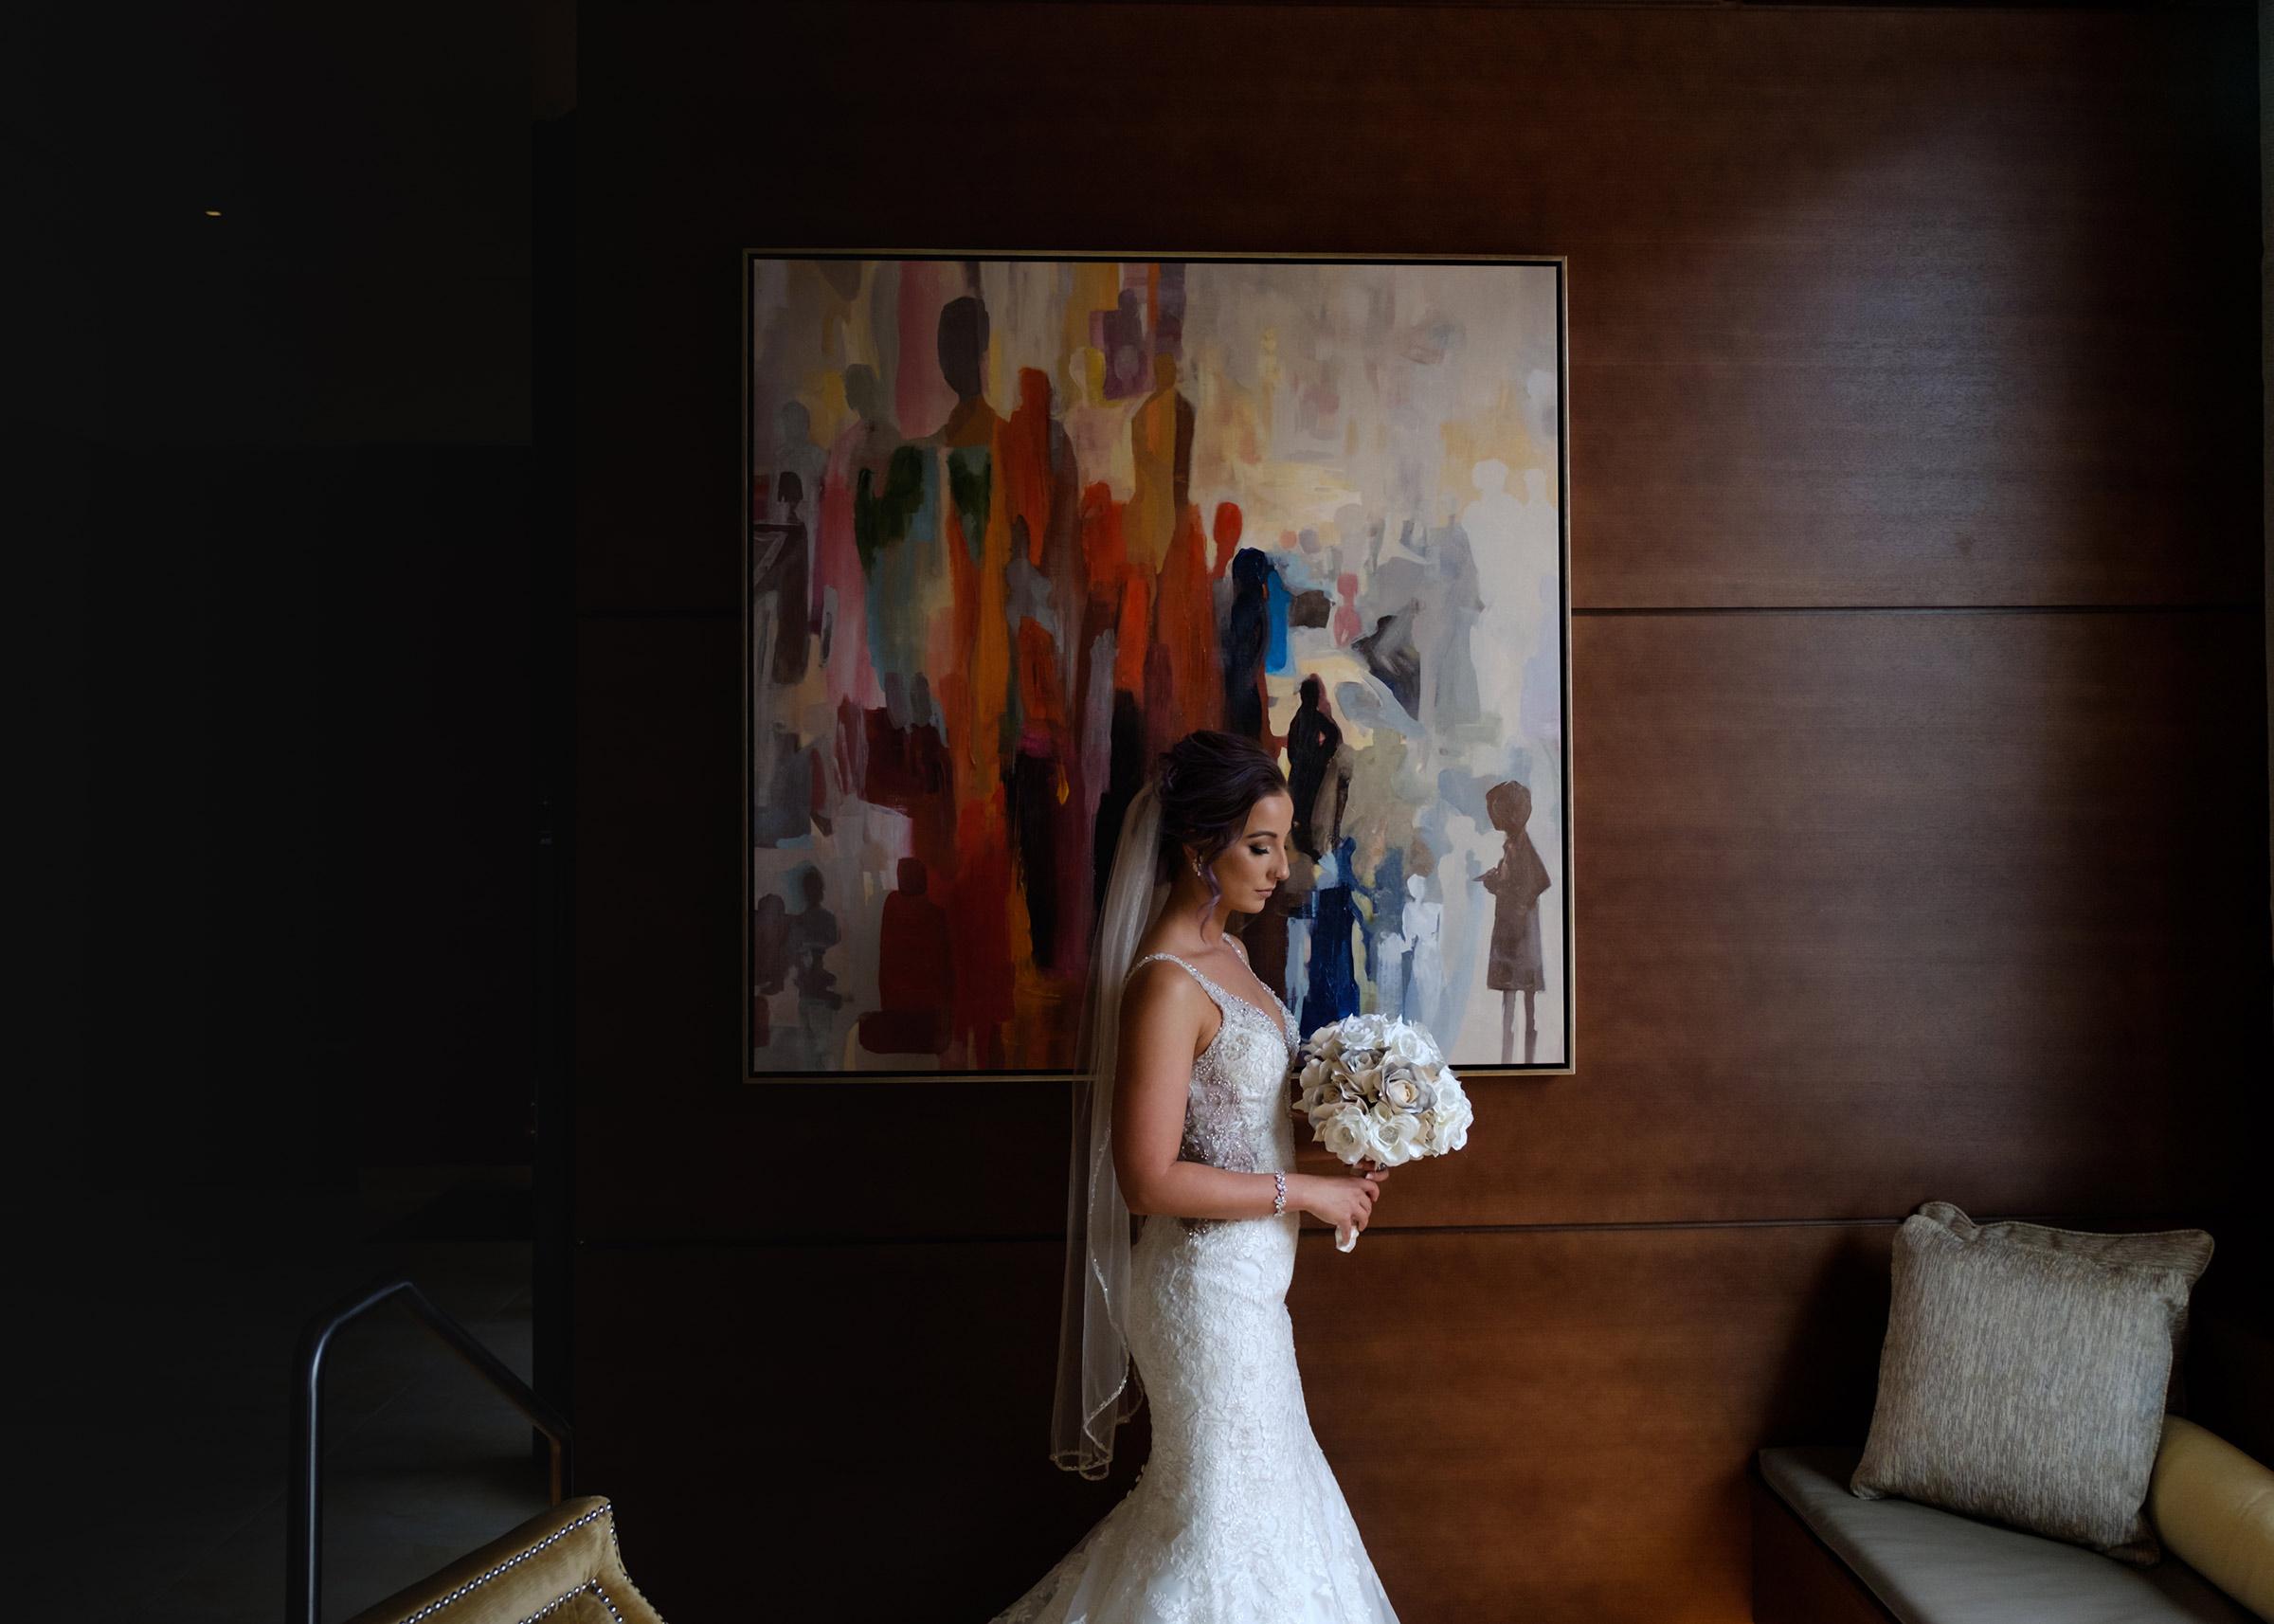 bride-in-front-of-lobby-artwork-desmoines-iowa-ac-hotel-raelyn-ramey-photography.jpg